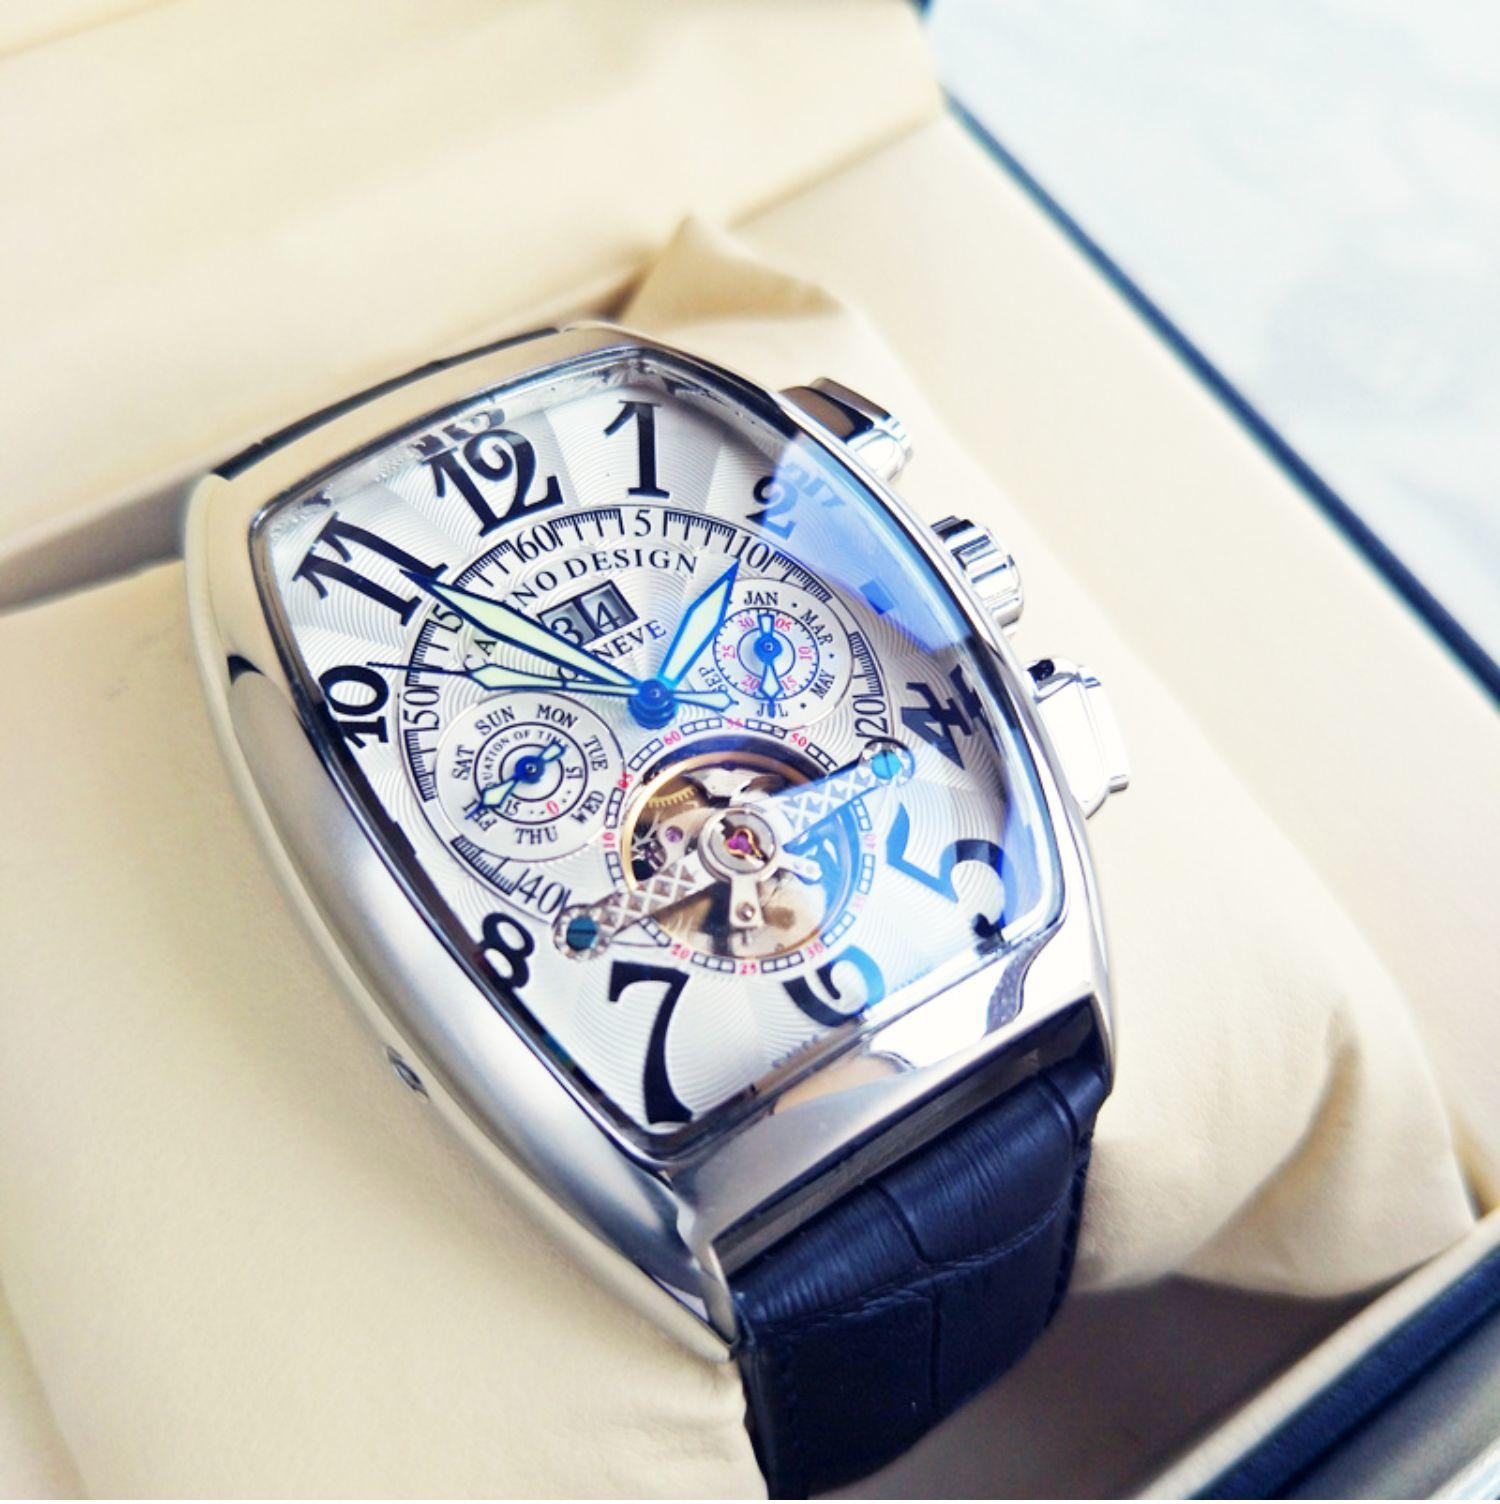 Frank-Miller- 최고 브랜드 럭셔리 남성 시계 FM Tourbillon Automaticquartz 시계 남성 방수 비즈니스 기계적 손목 시계 Y1214